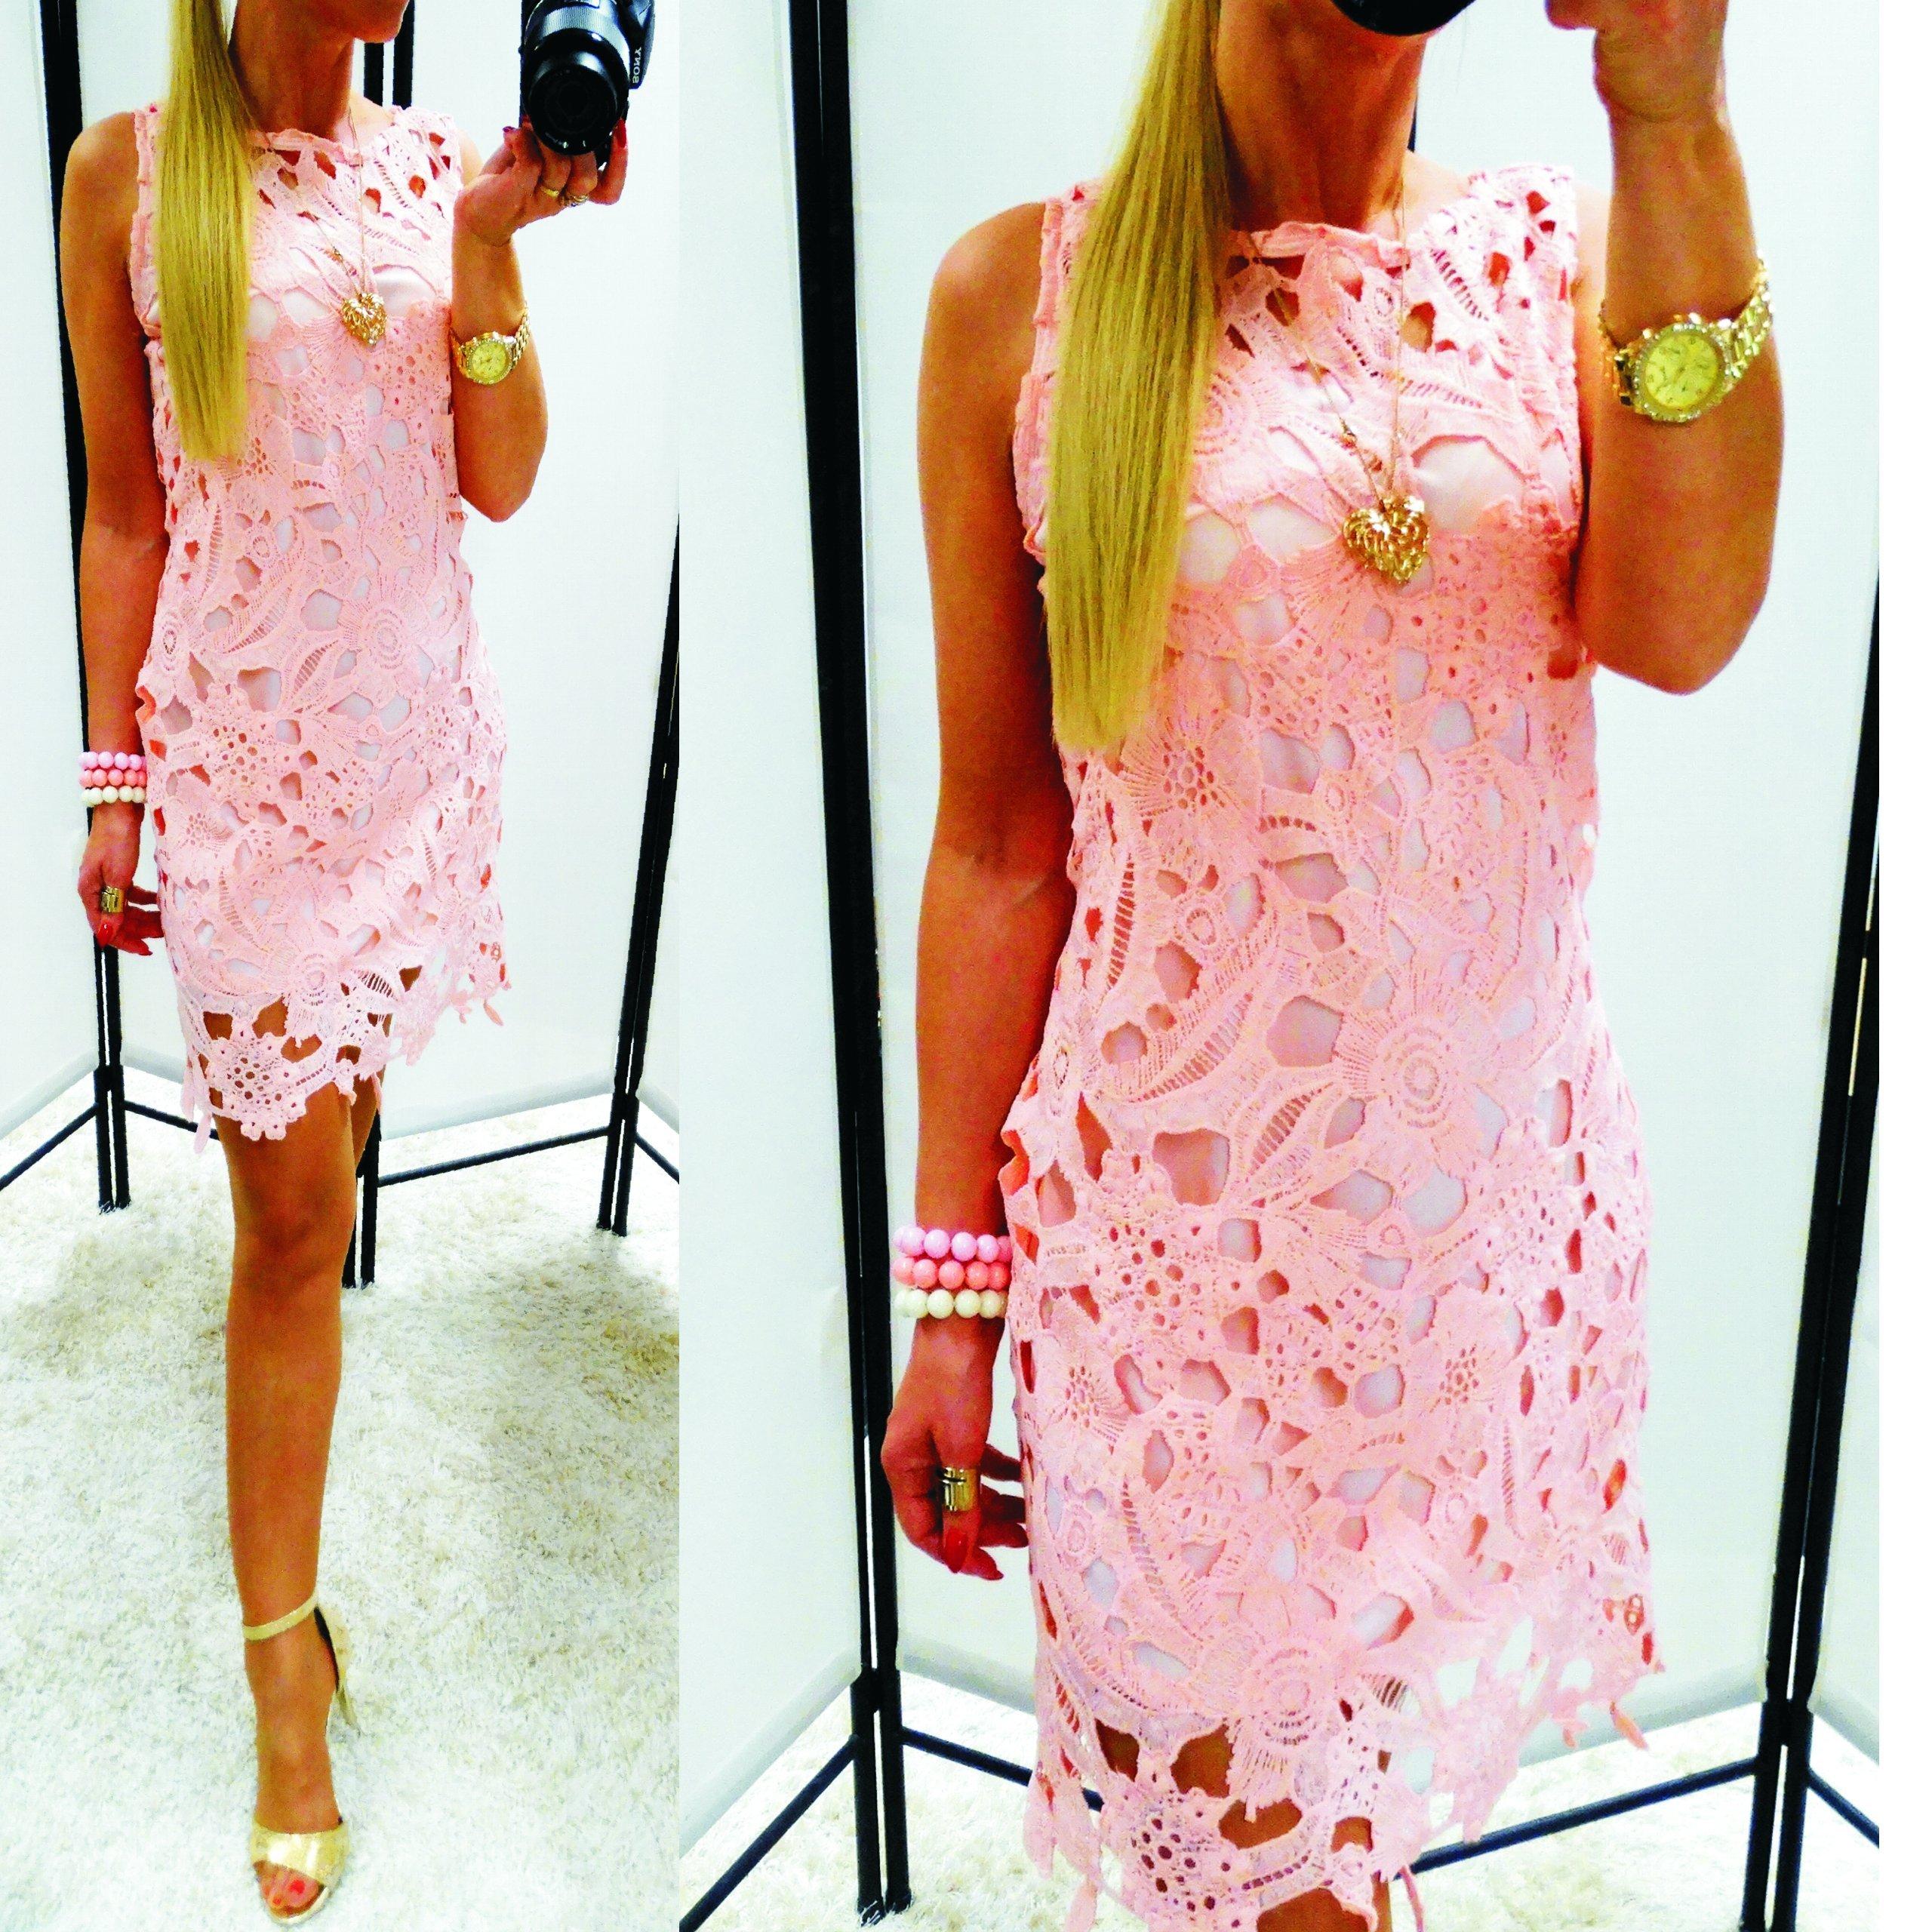 7bb884fdff Gipiura haftowana koronka sukienka grube hafty S - 7353087812 ...